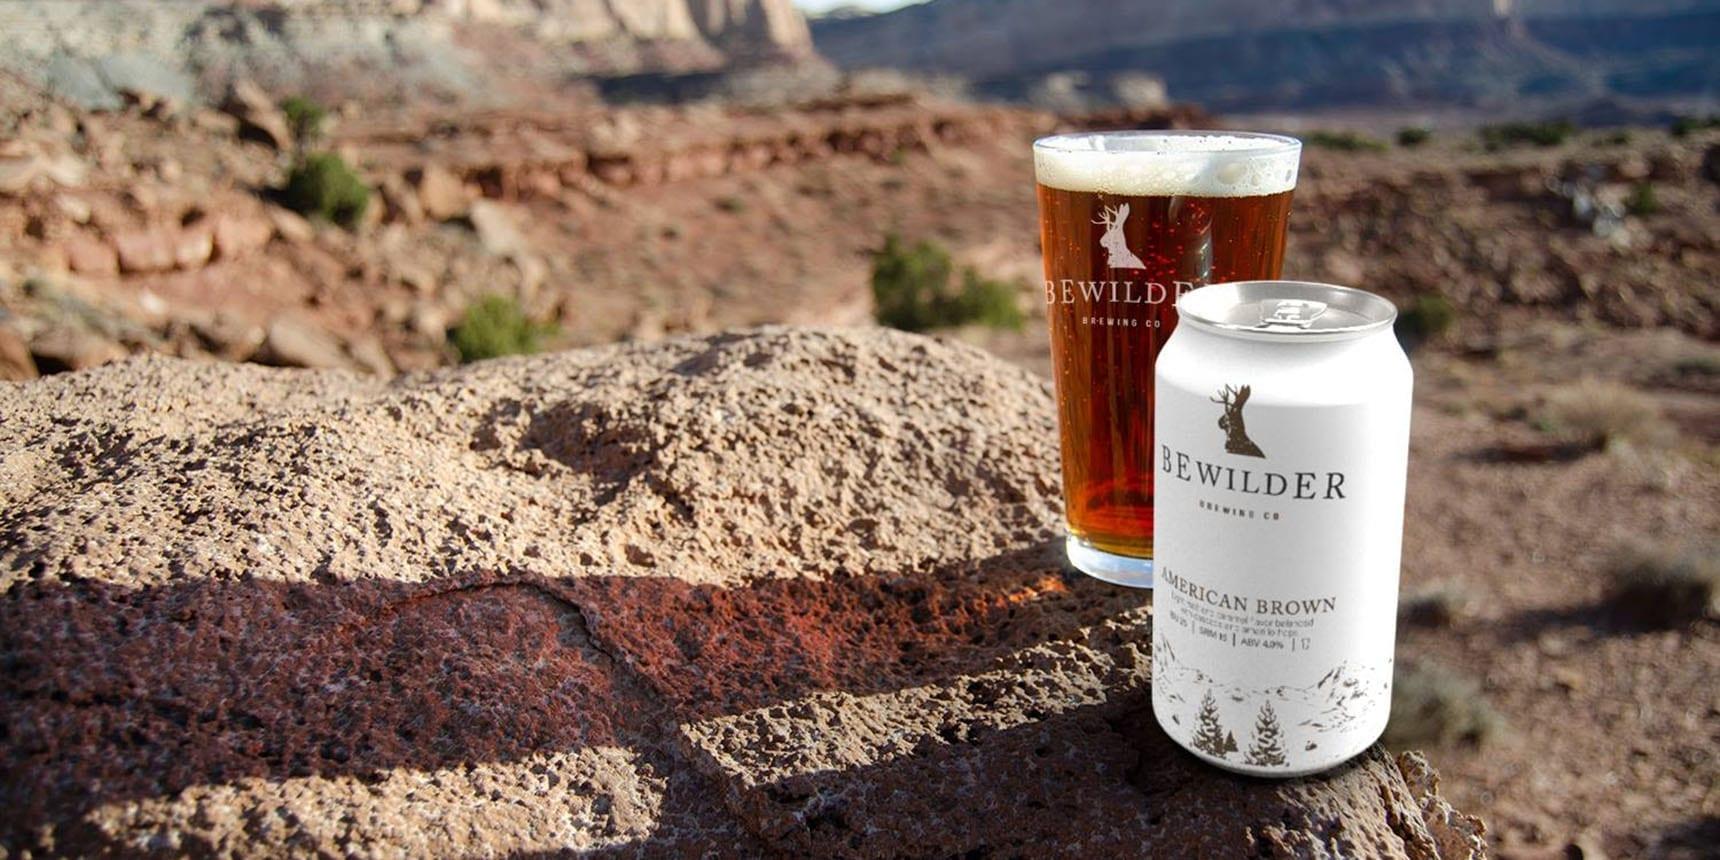 Bewilder Brewing - Copyright Bewilder Brewing